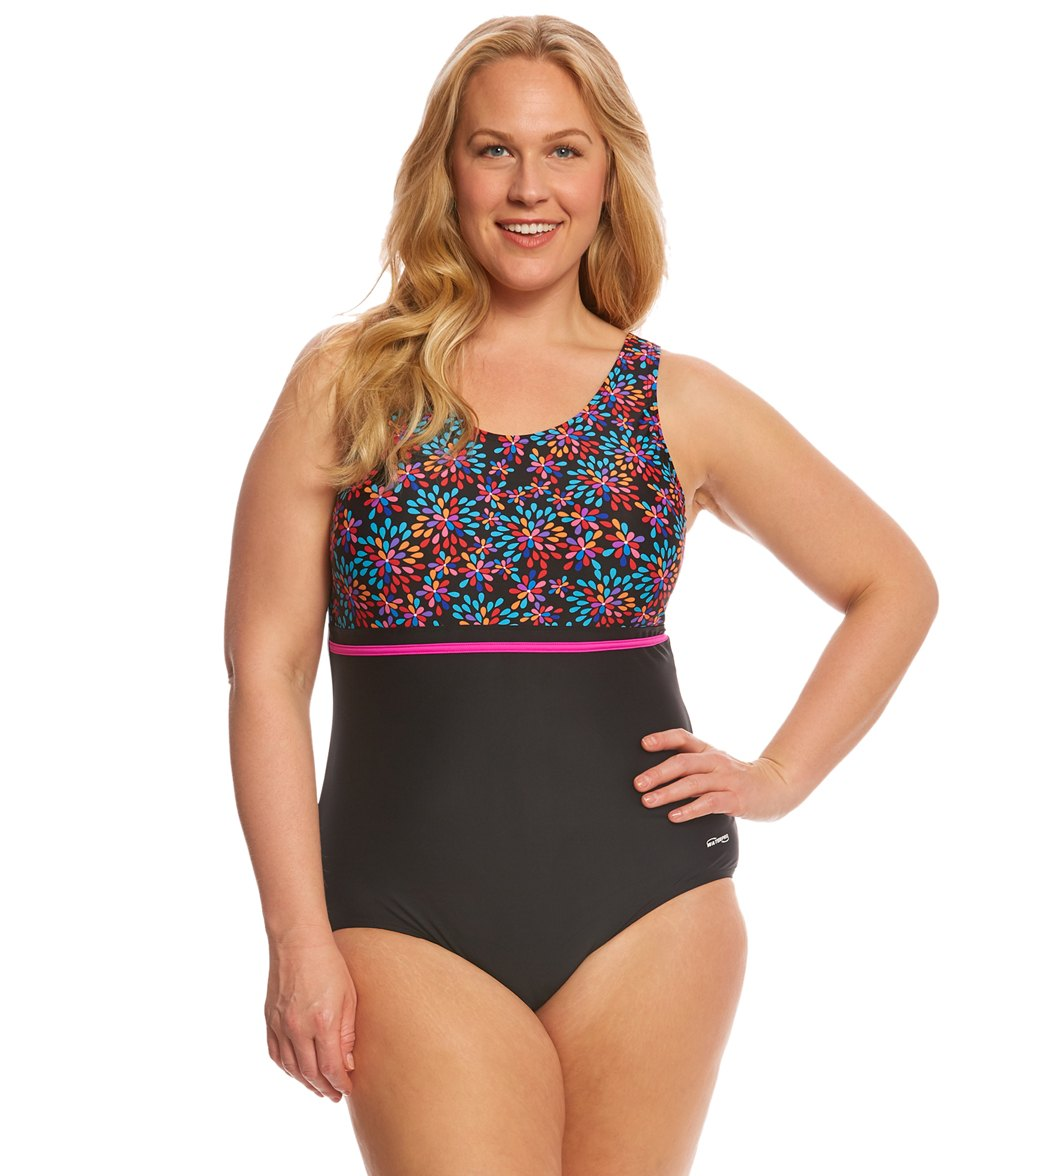 937d7e18cf7a6 Waterpro Women s Plus Size Floral Burst Splice U-Back One Piece Swimsuit